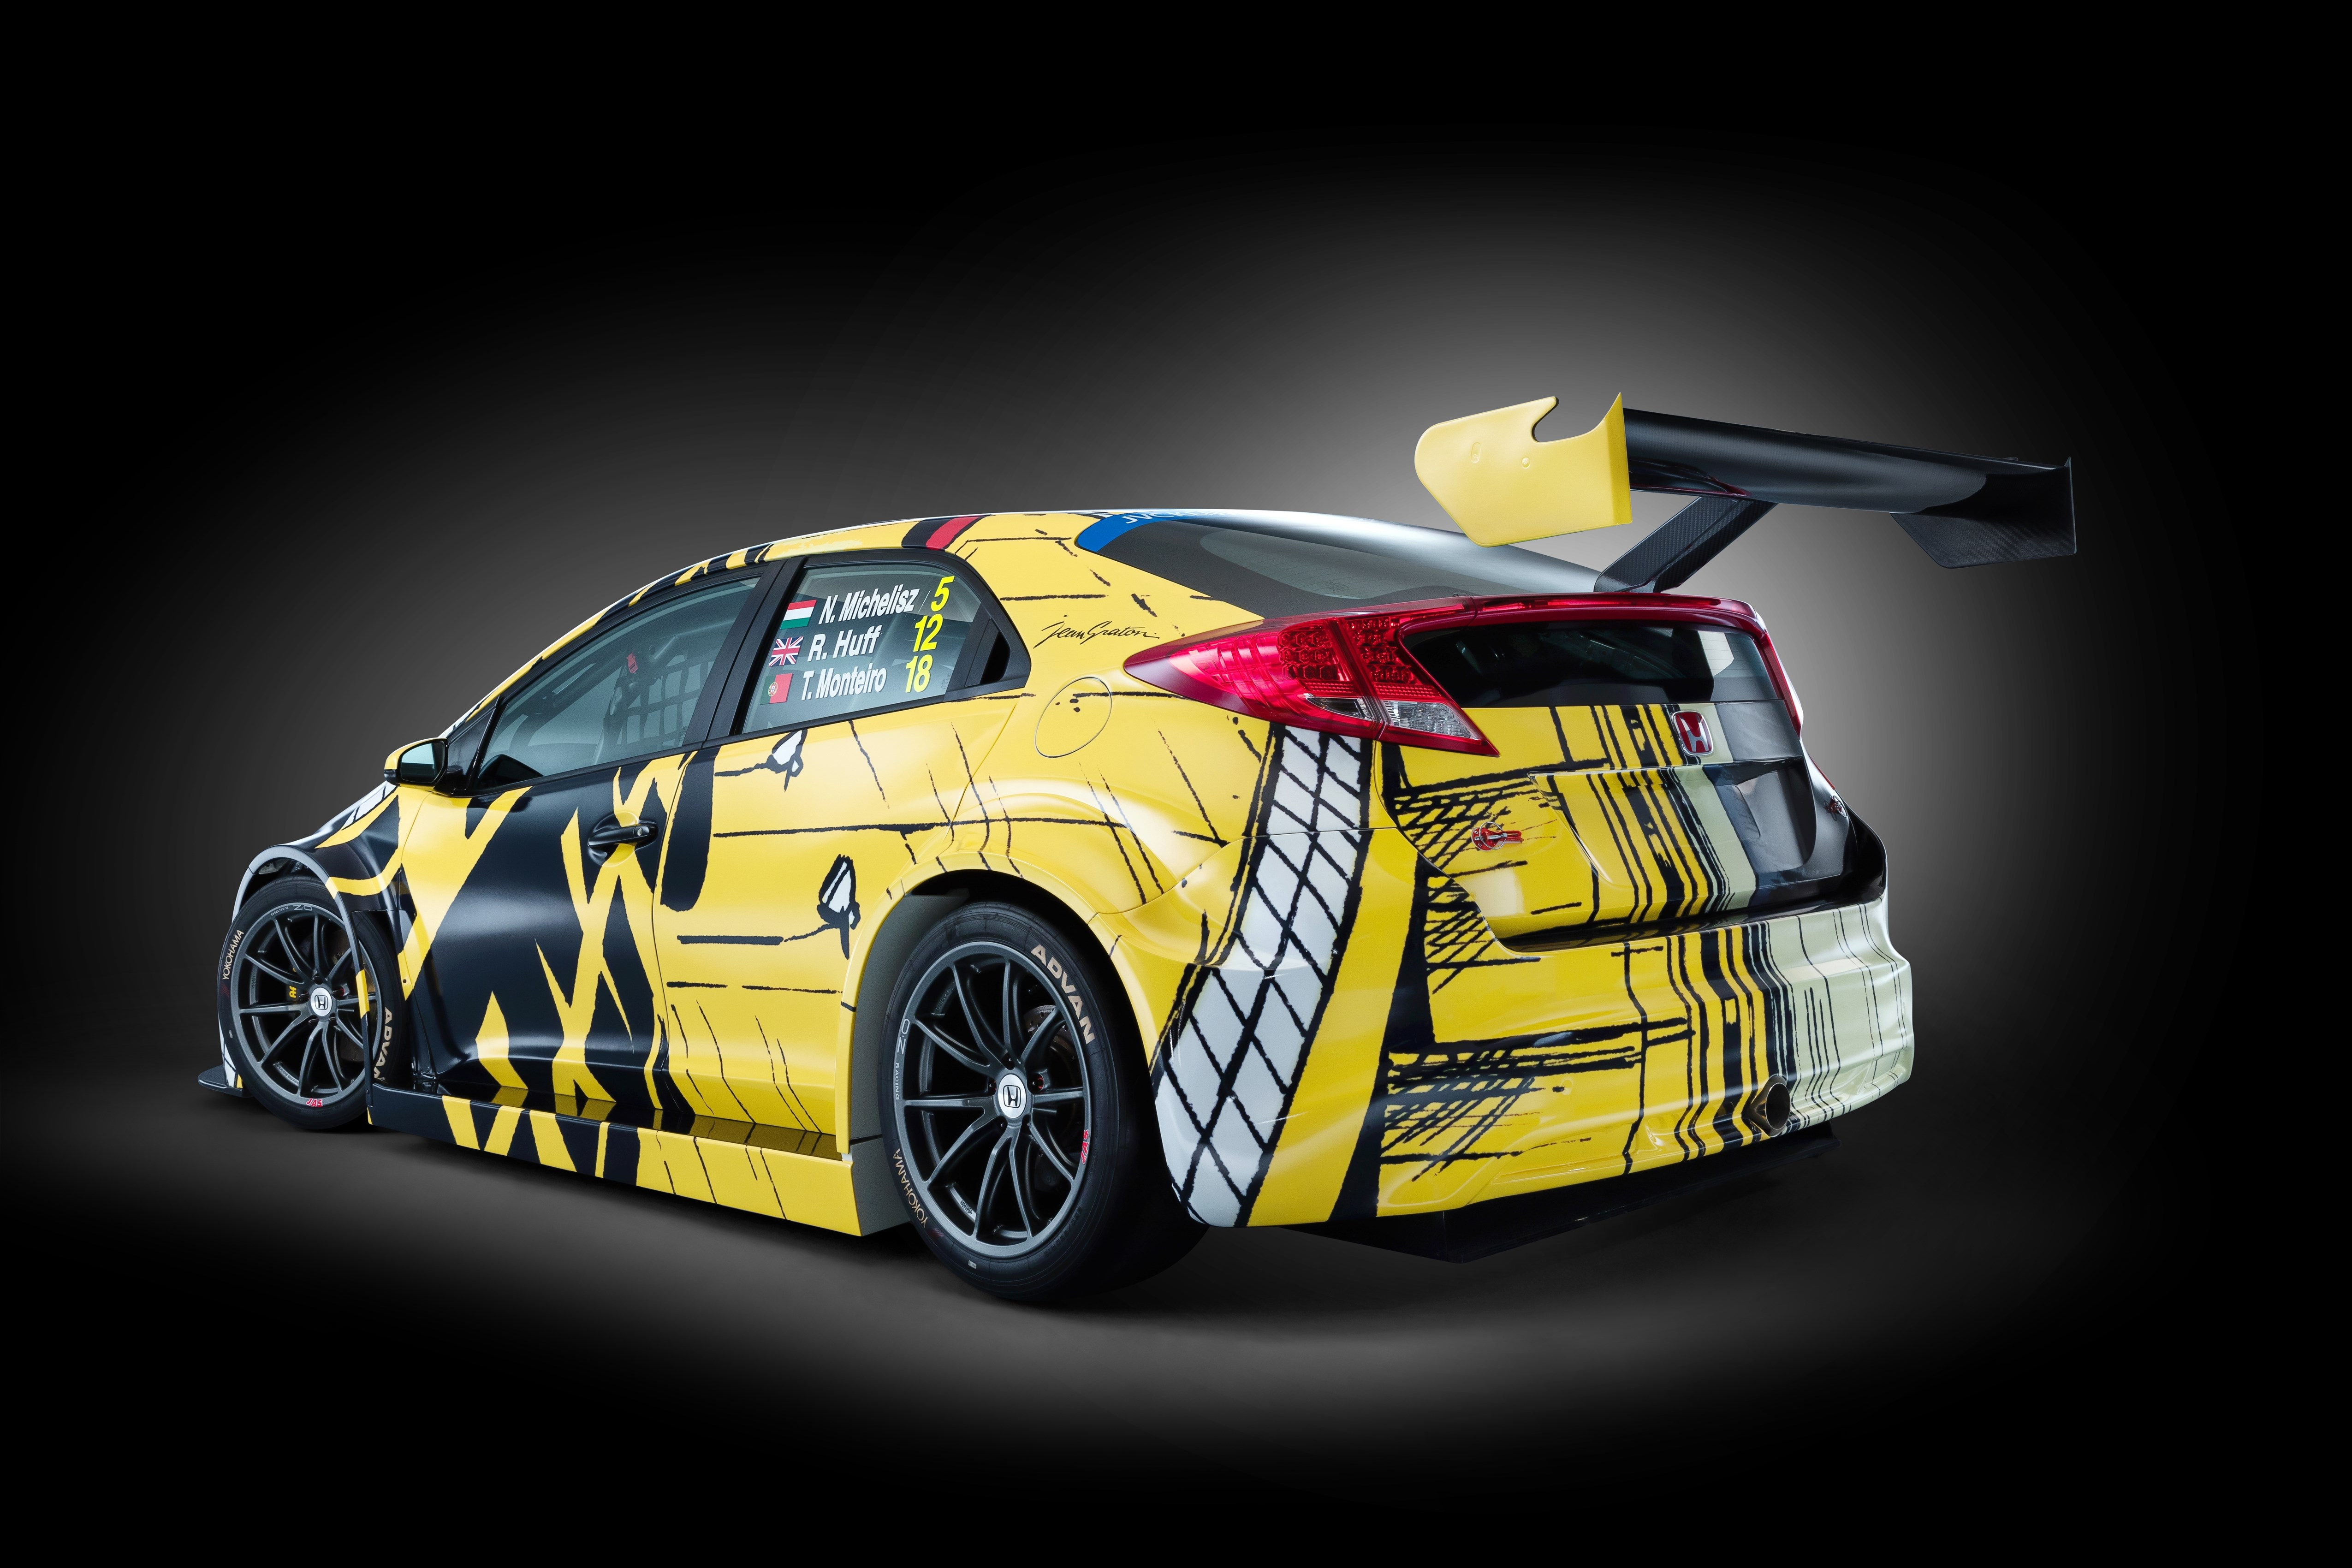 Michel Vaillant Inspired Honda Art Car To Make Race Debut